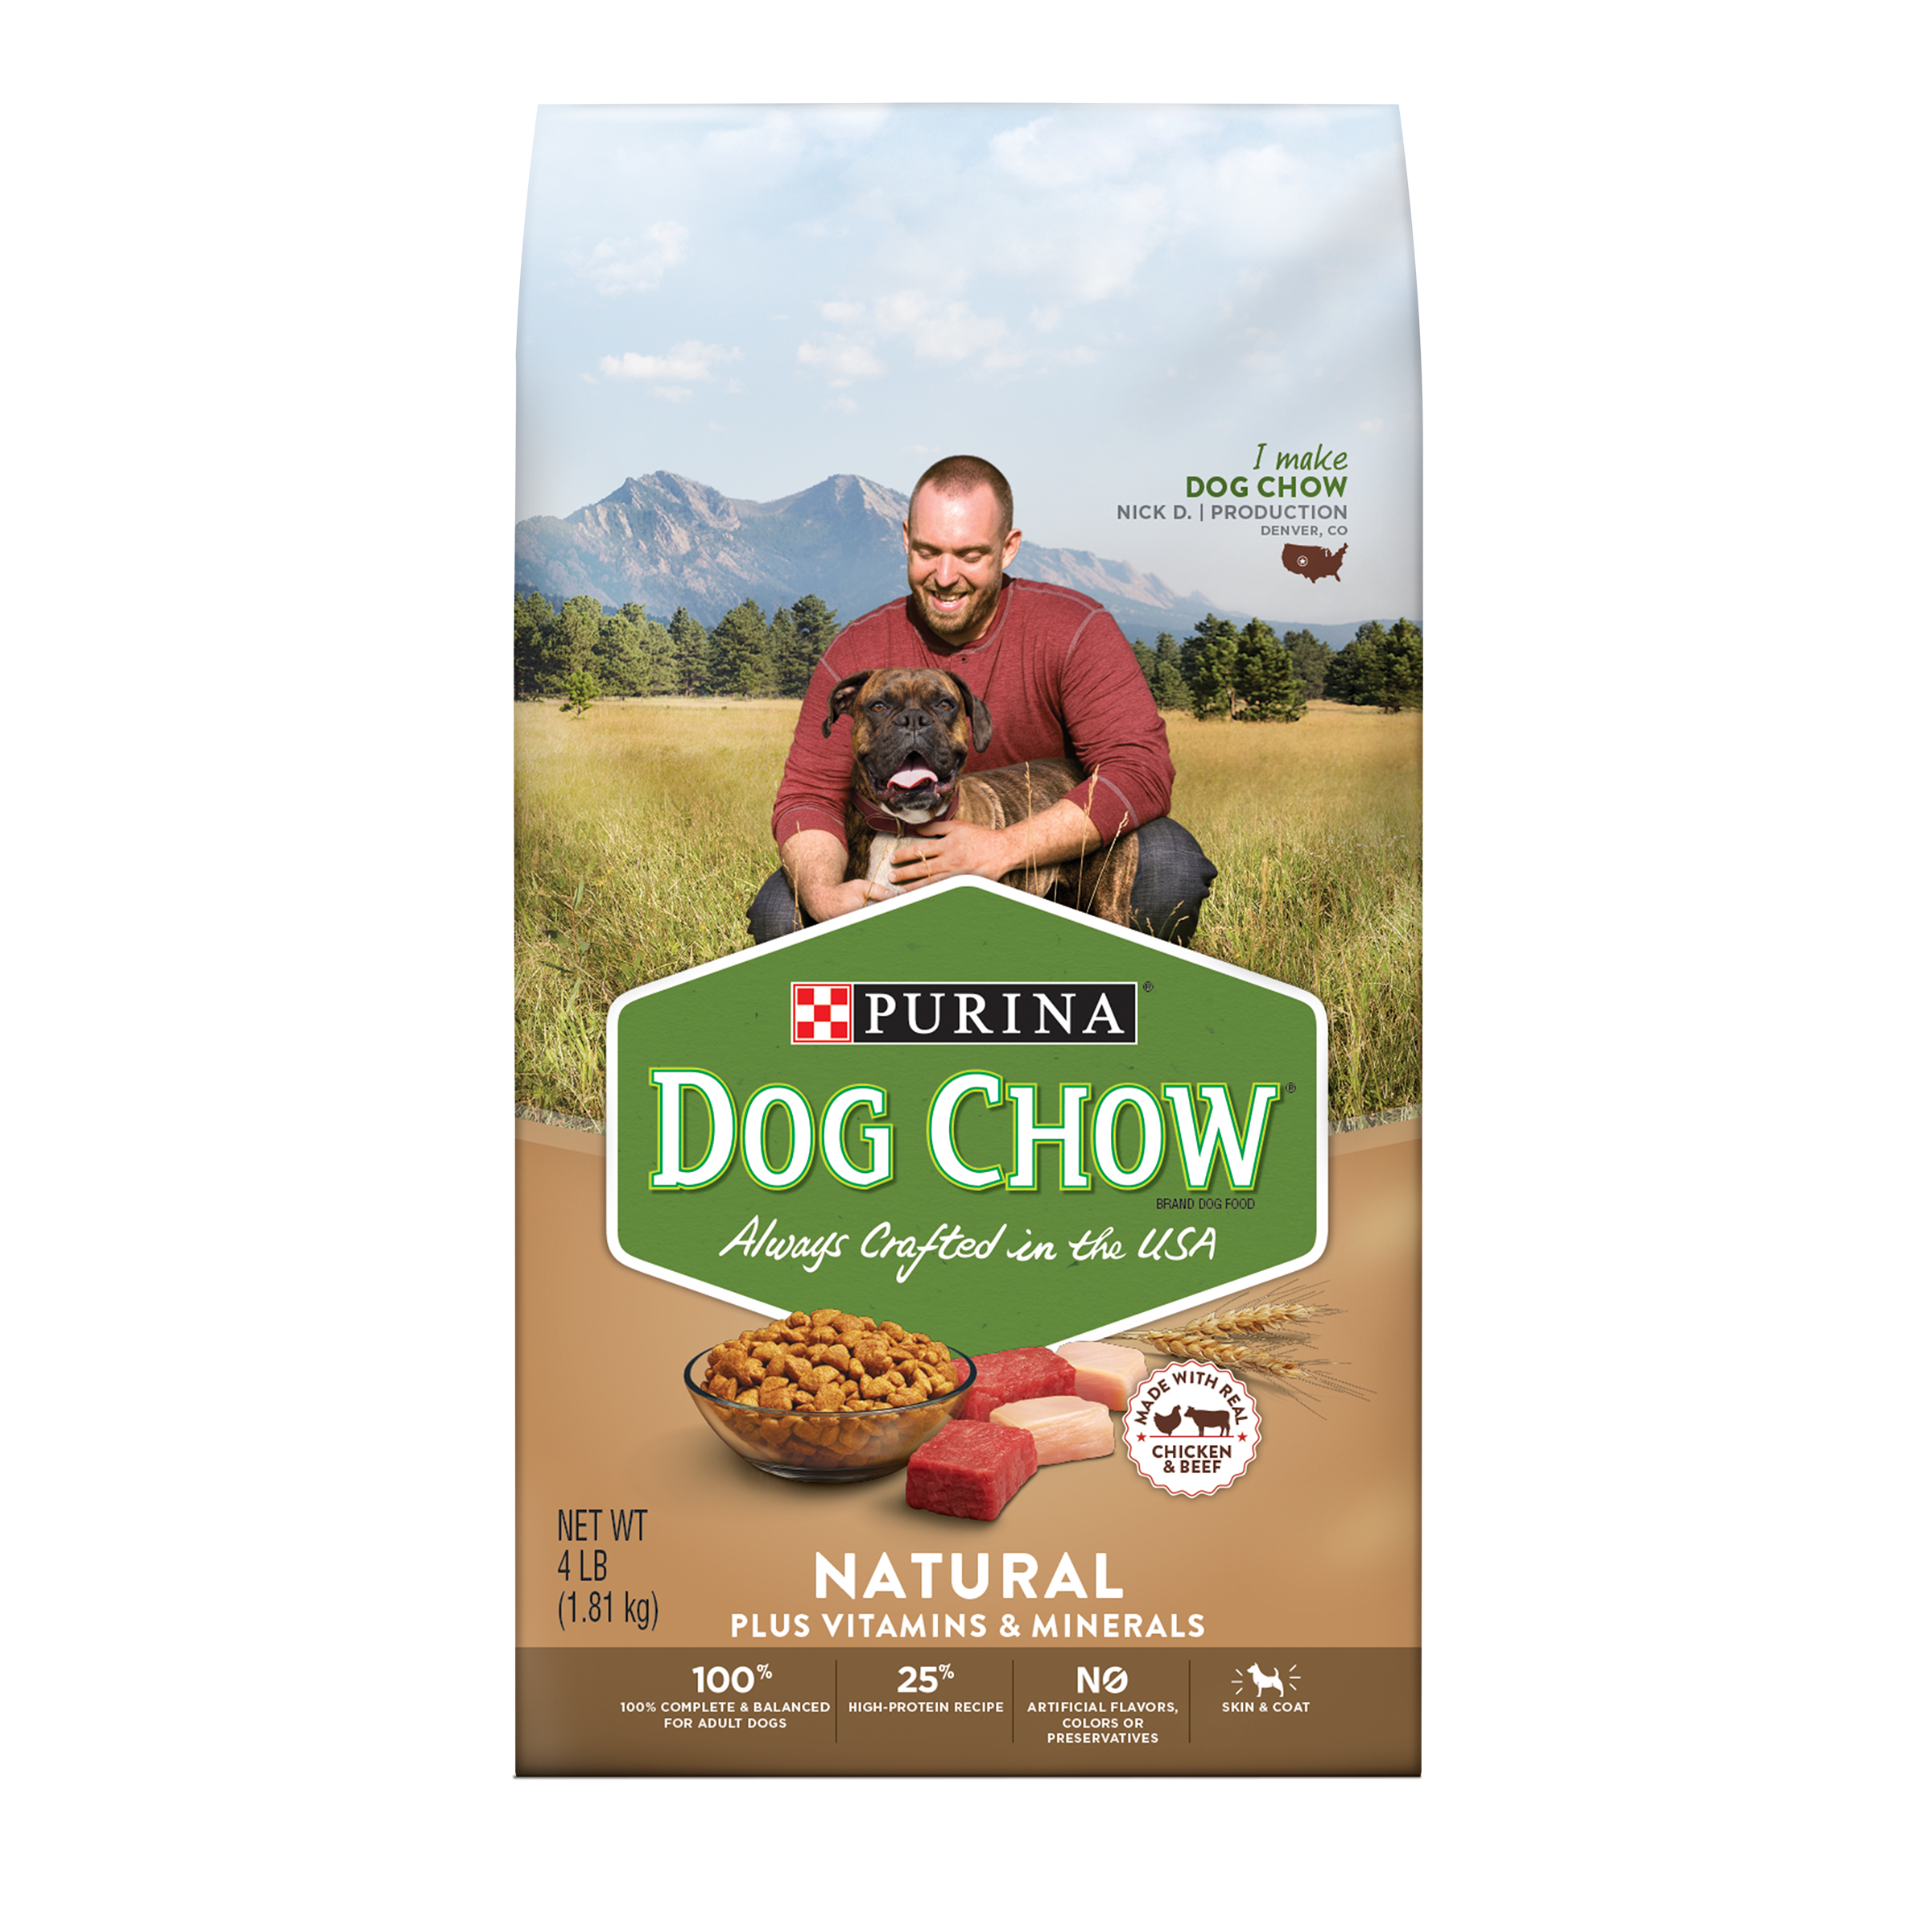 Purina Dog Chow Natural, High Protein Dry Dog Food; Natural - 4 lb. Bag